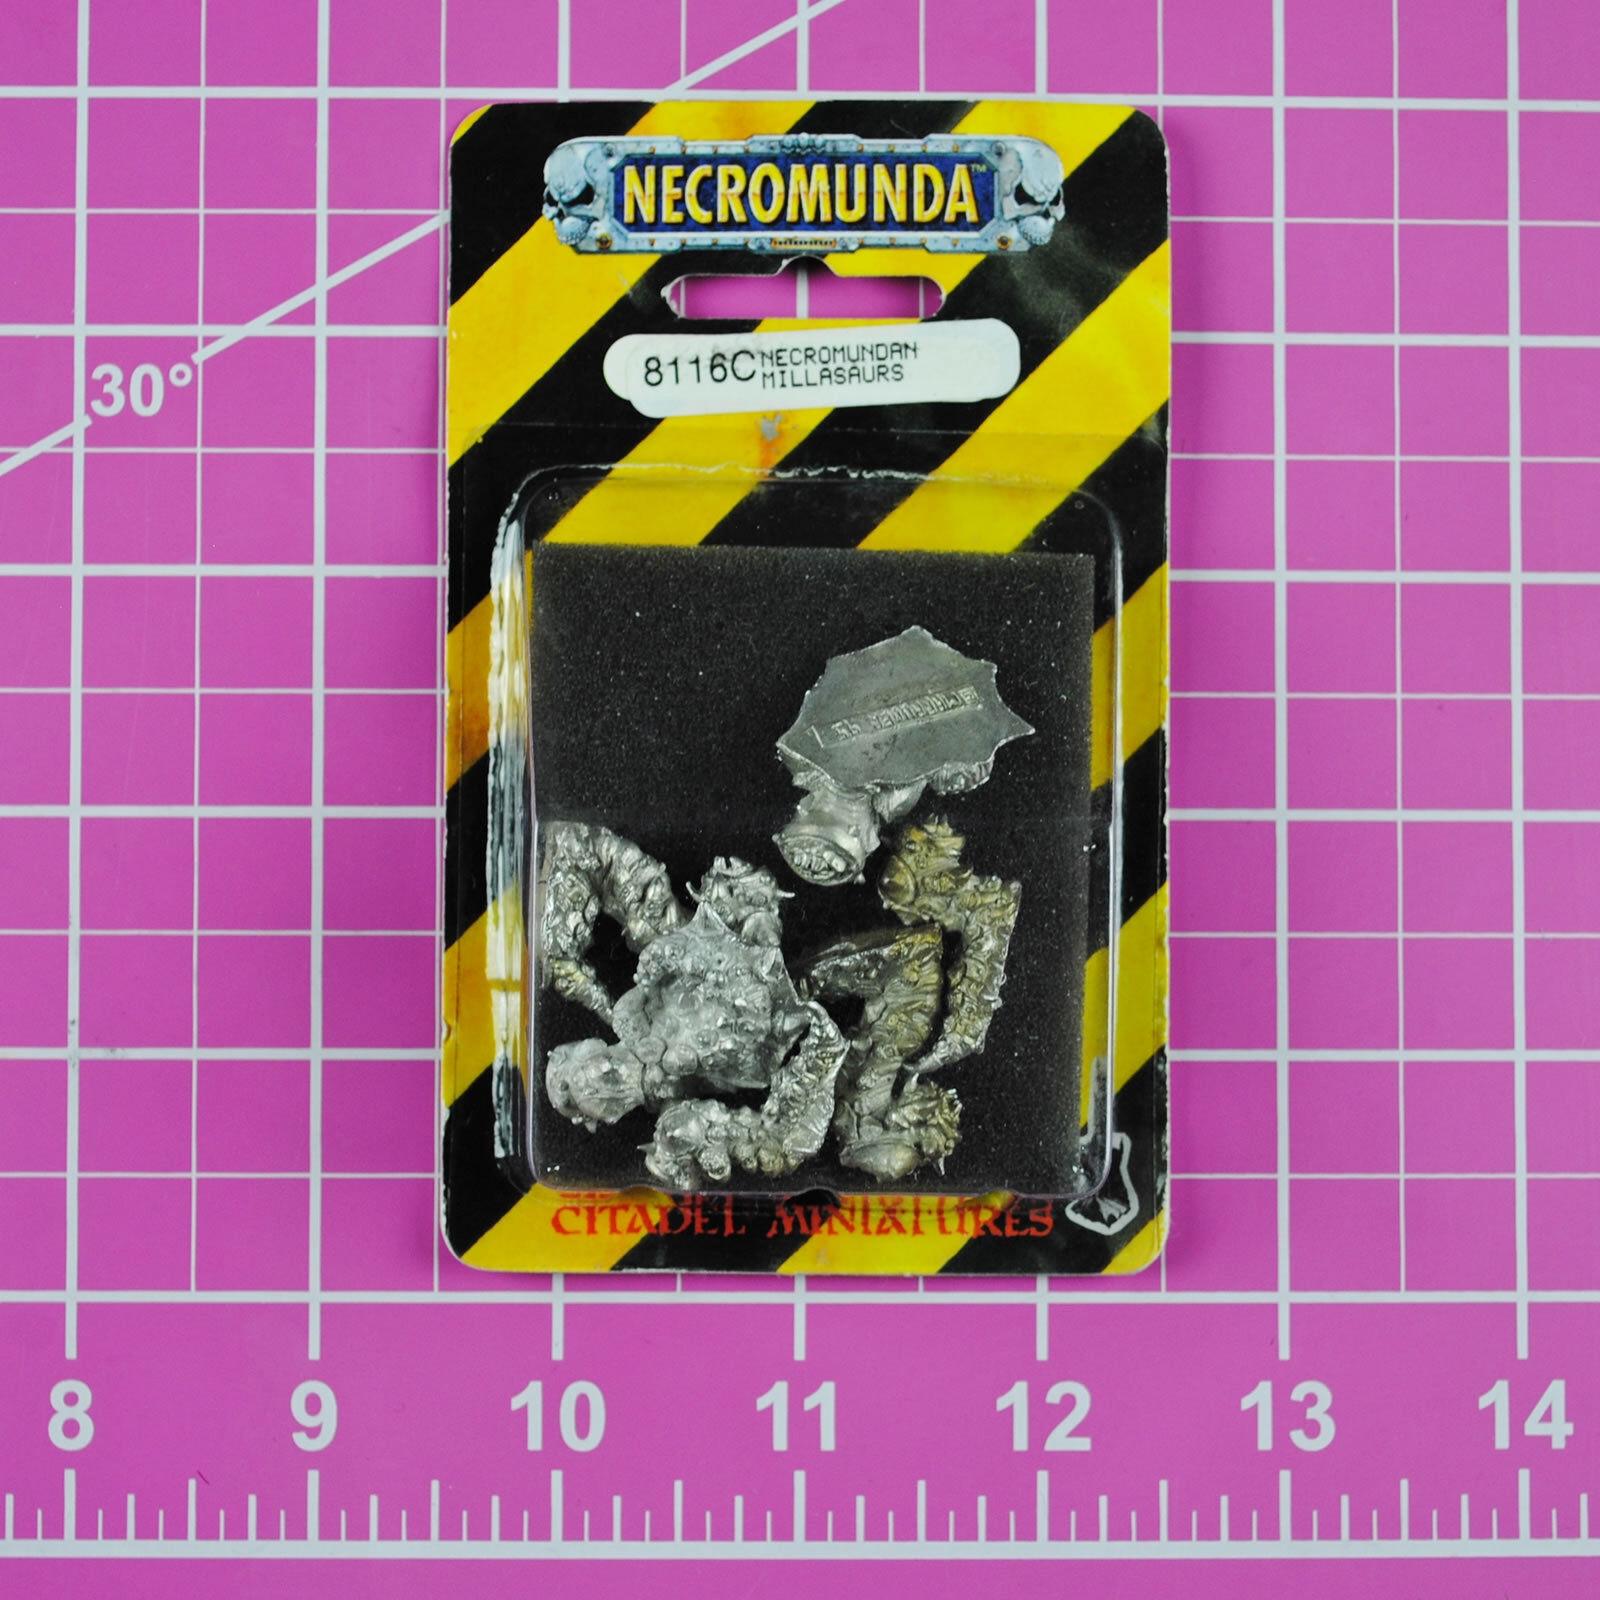 Necromunda Millasaurs NIB - Rare OOP Games Workshop Warhammer 40K (Beastmaster)